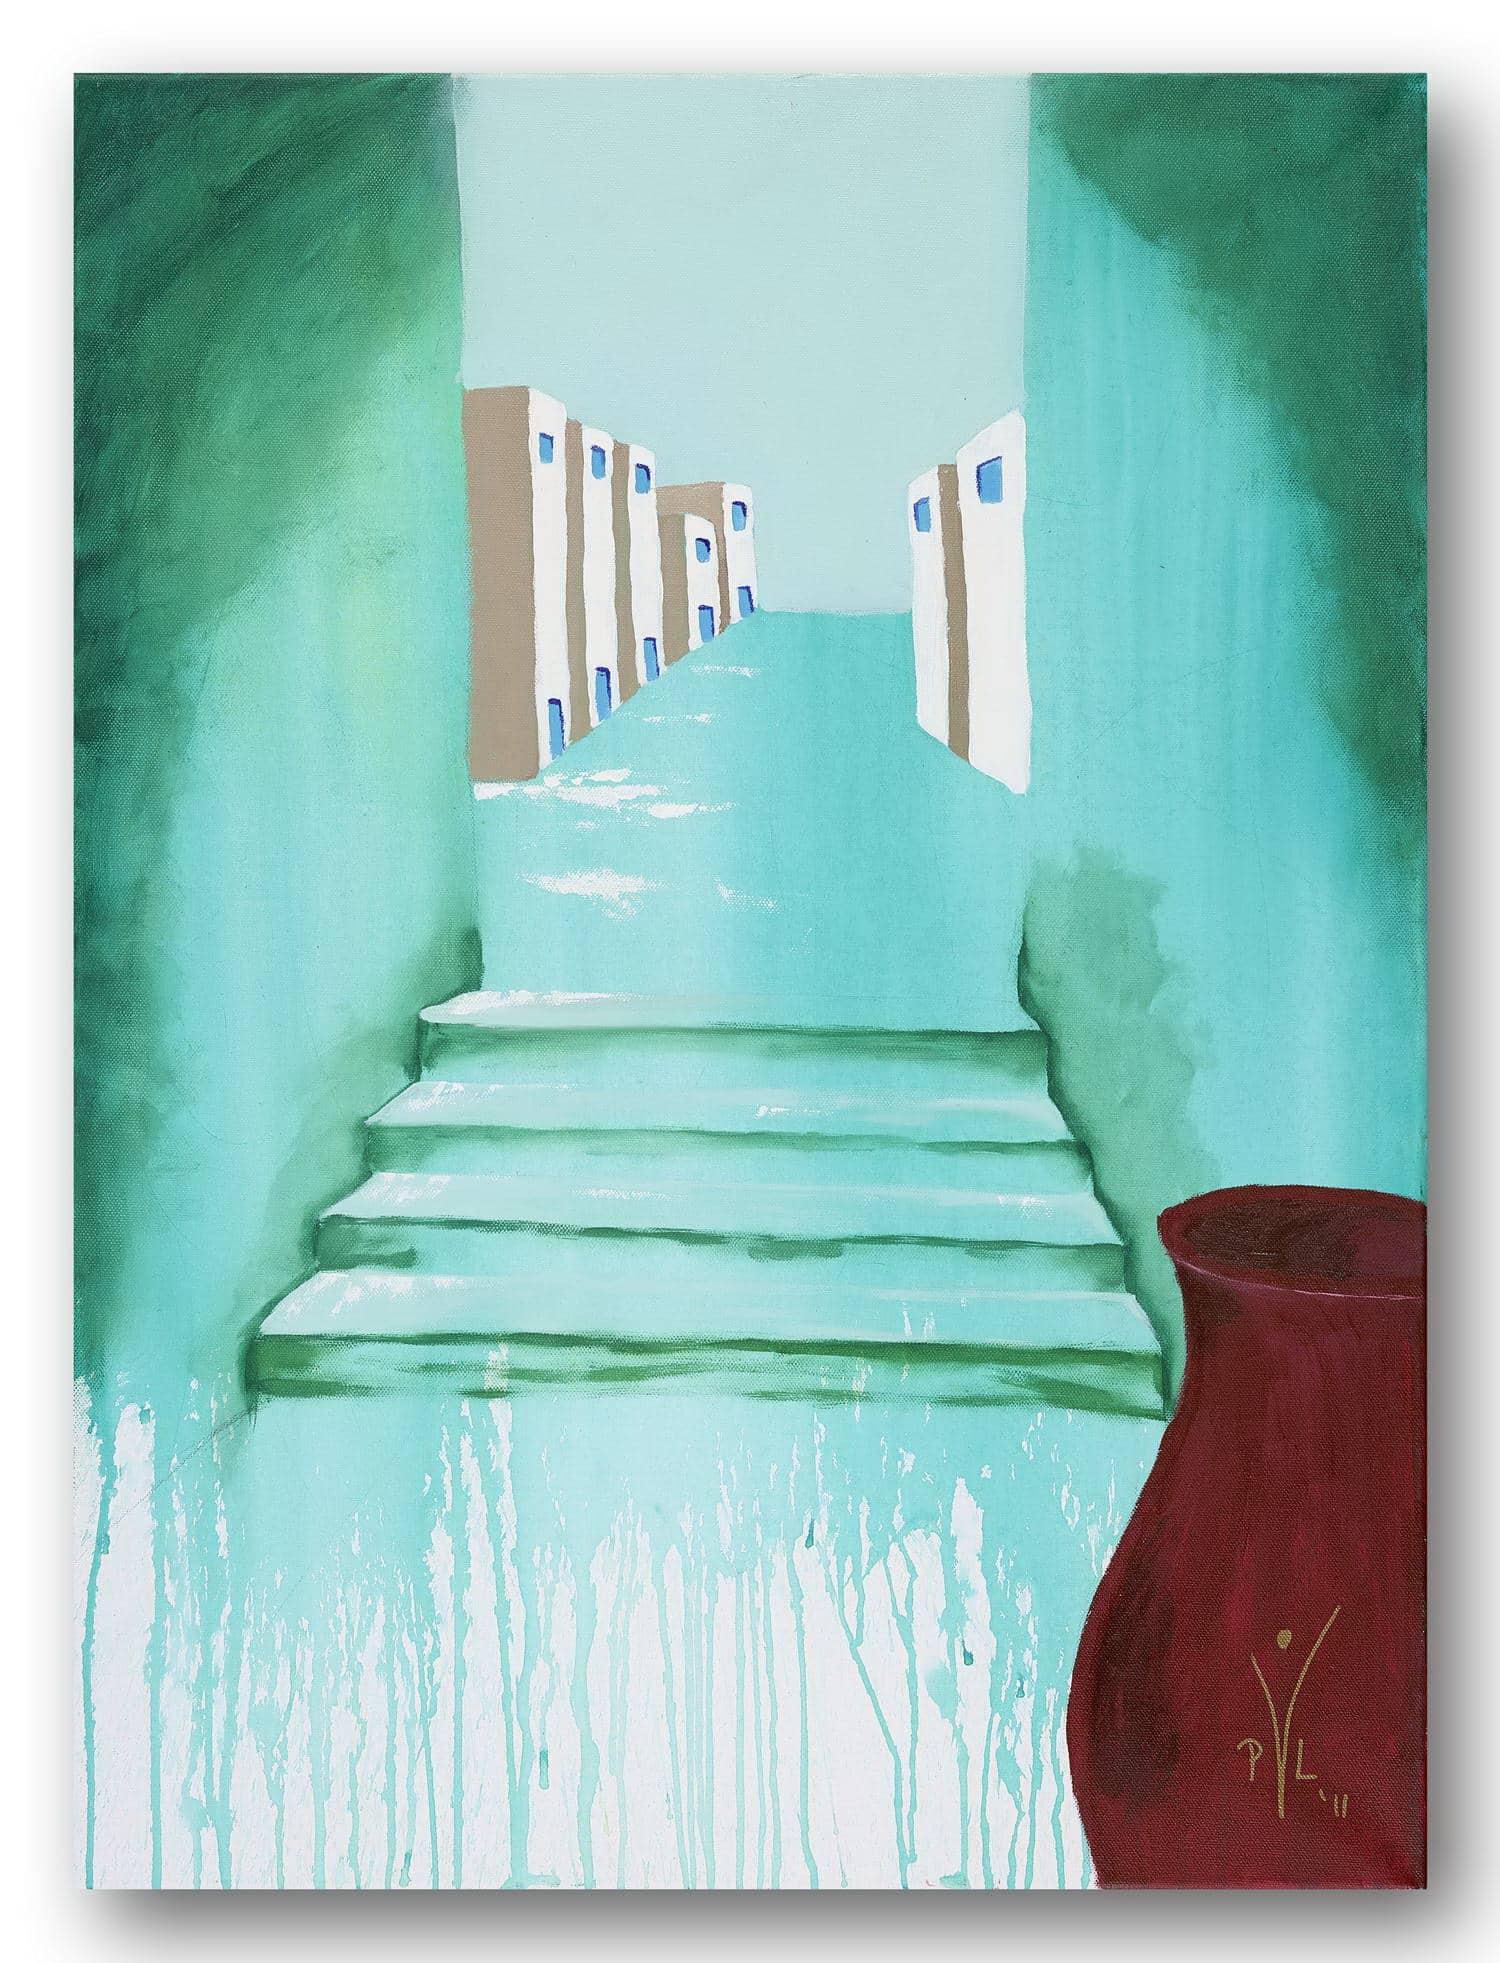 Treppe ins Glück - Acrylic / Canvas 60 x 80 cm, 23.6 x 31.5 inch